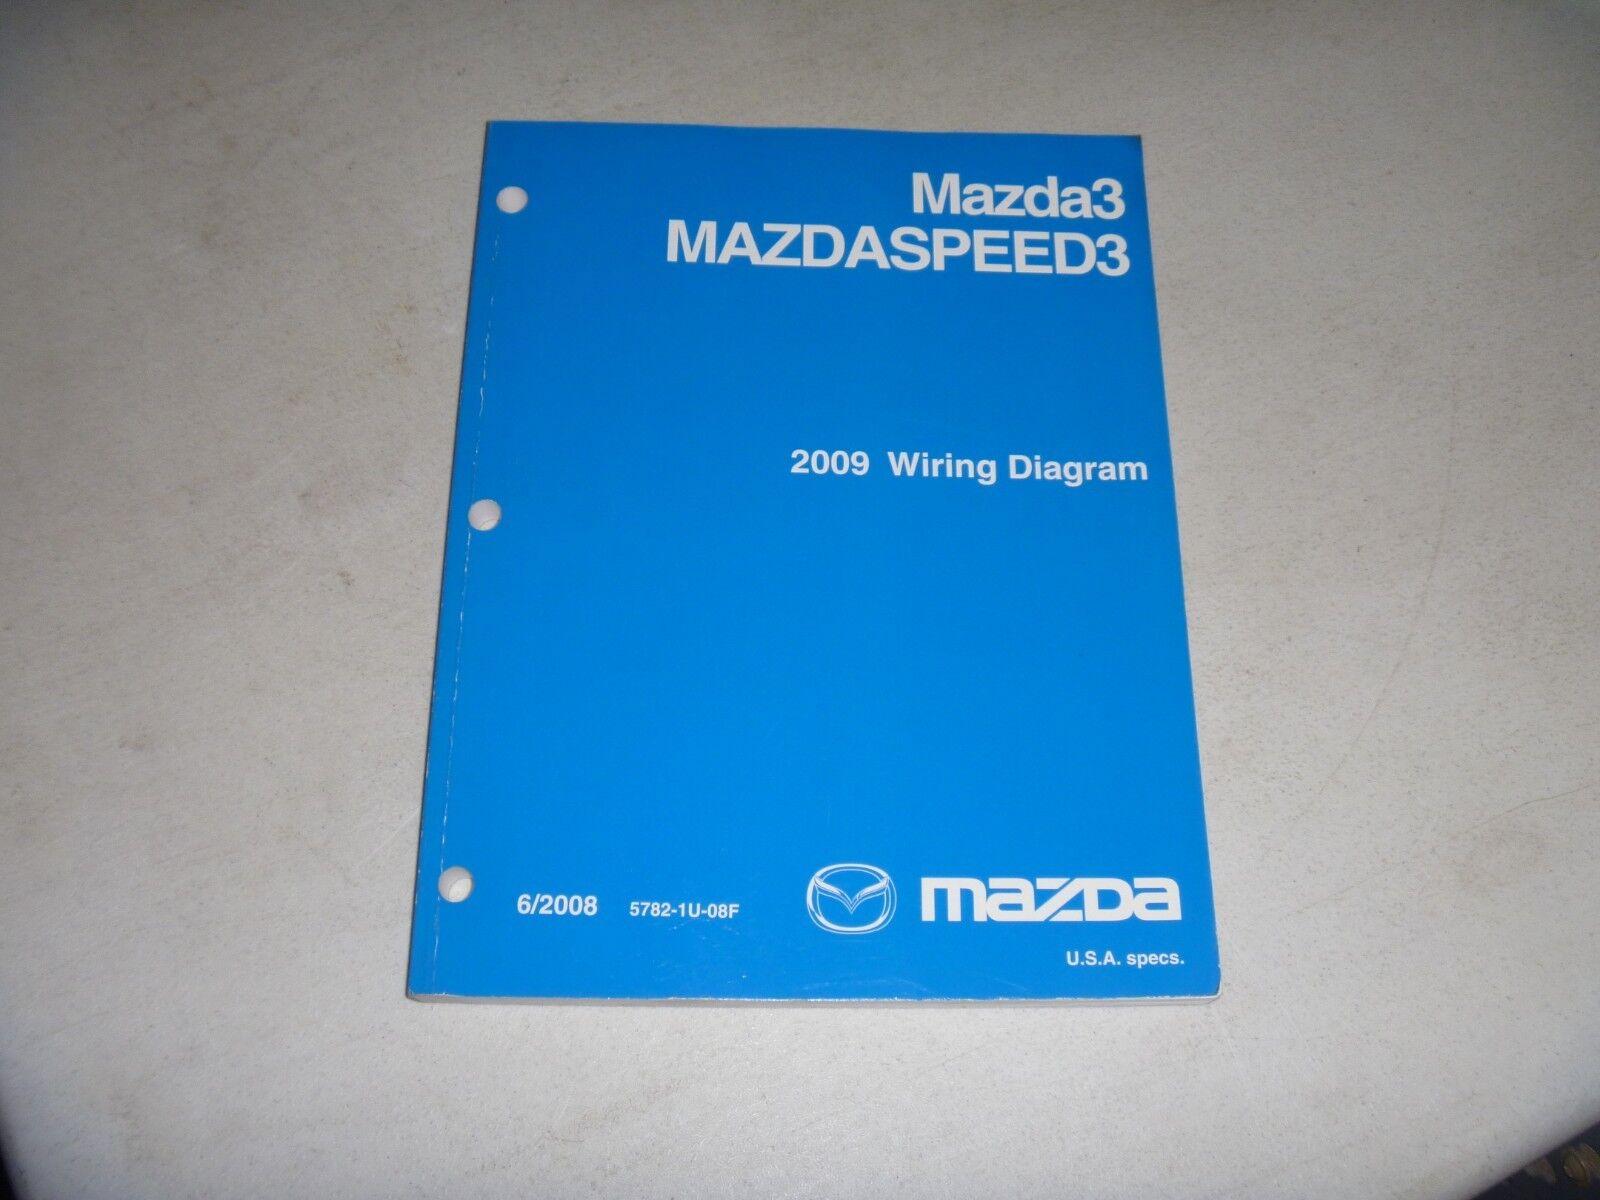 2009 Mazda 3 Mazda3 Mazdaspeed3 Electrical Wiring Diagram Manual